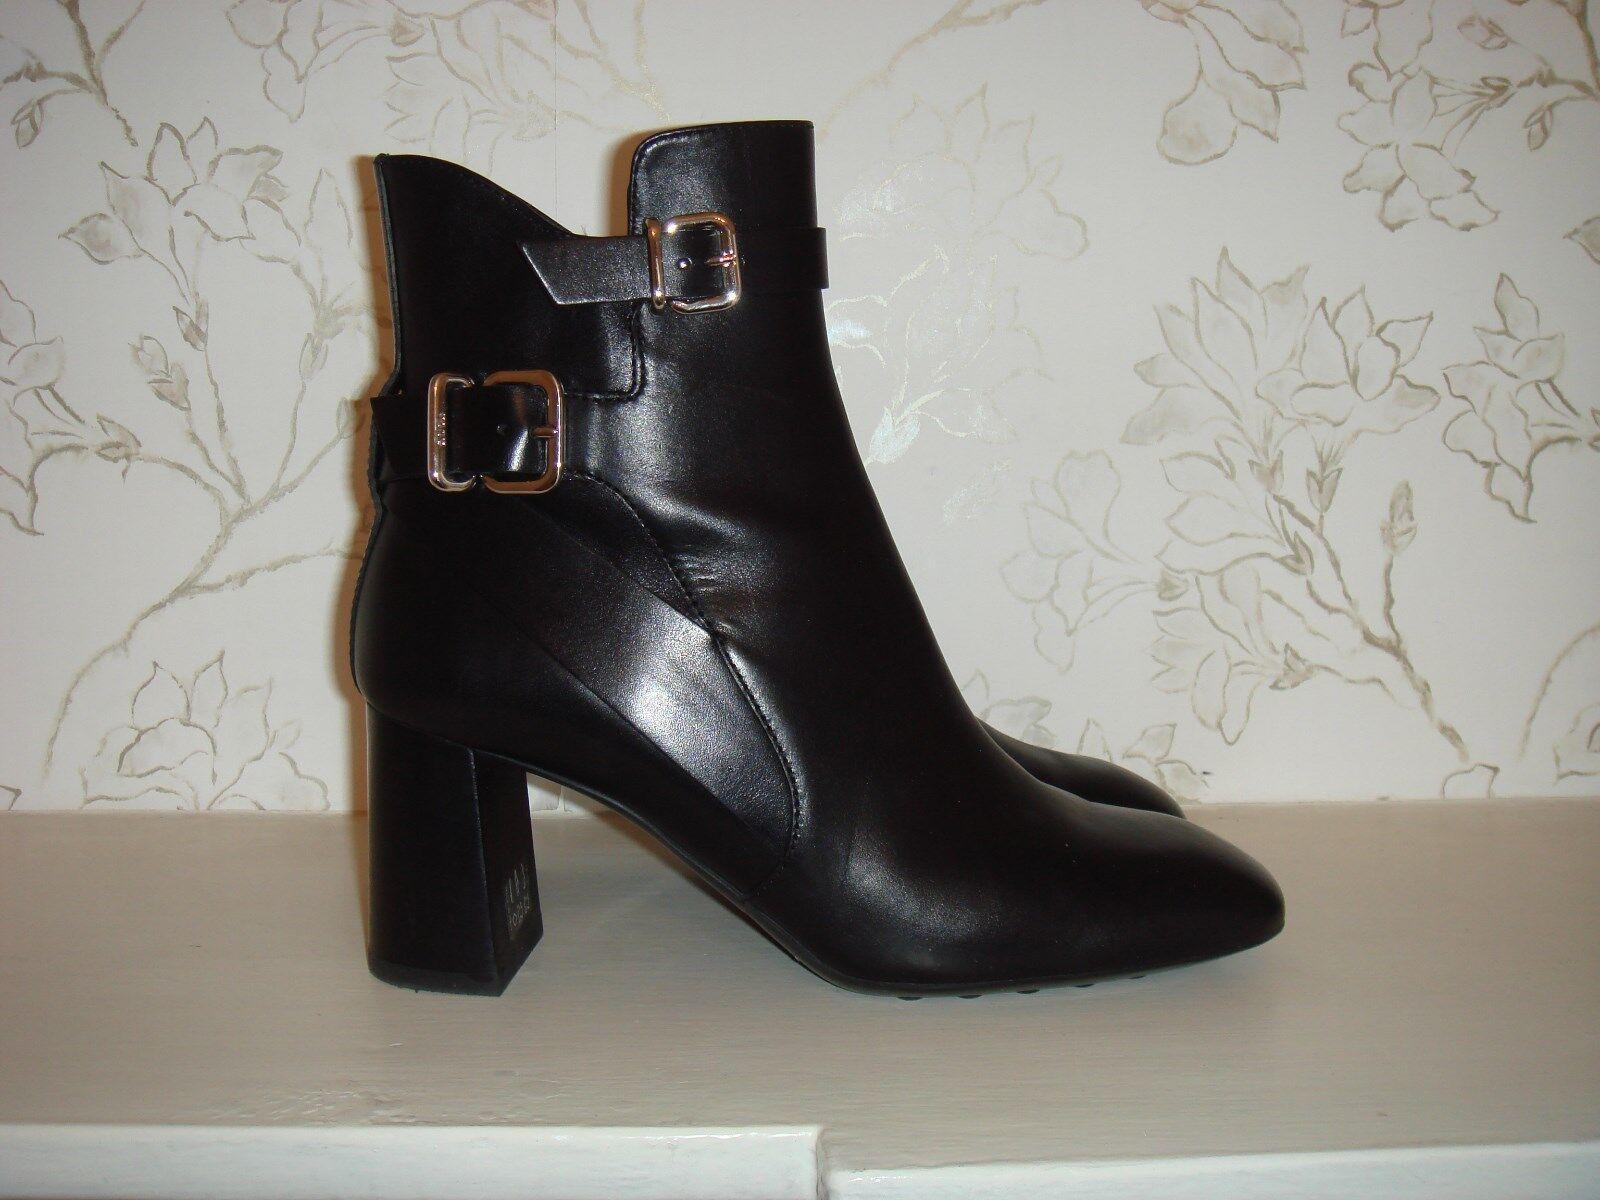 Nouveau TOD'S Femme Bottines en cuir noir taille 37 Made in